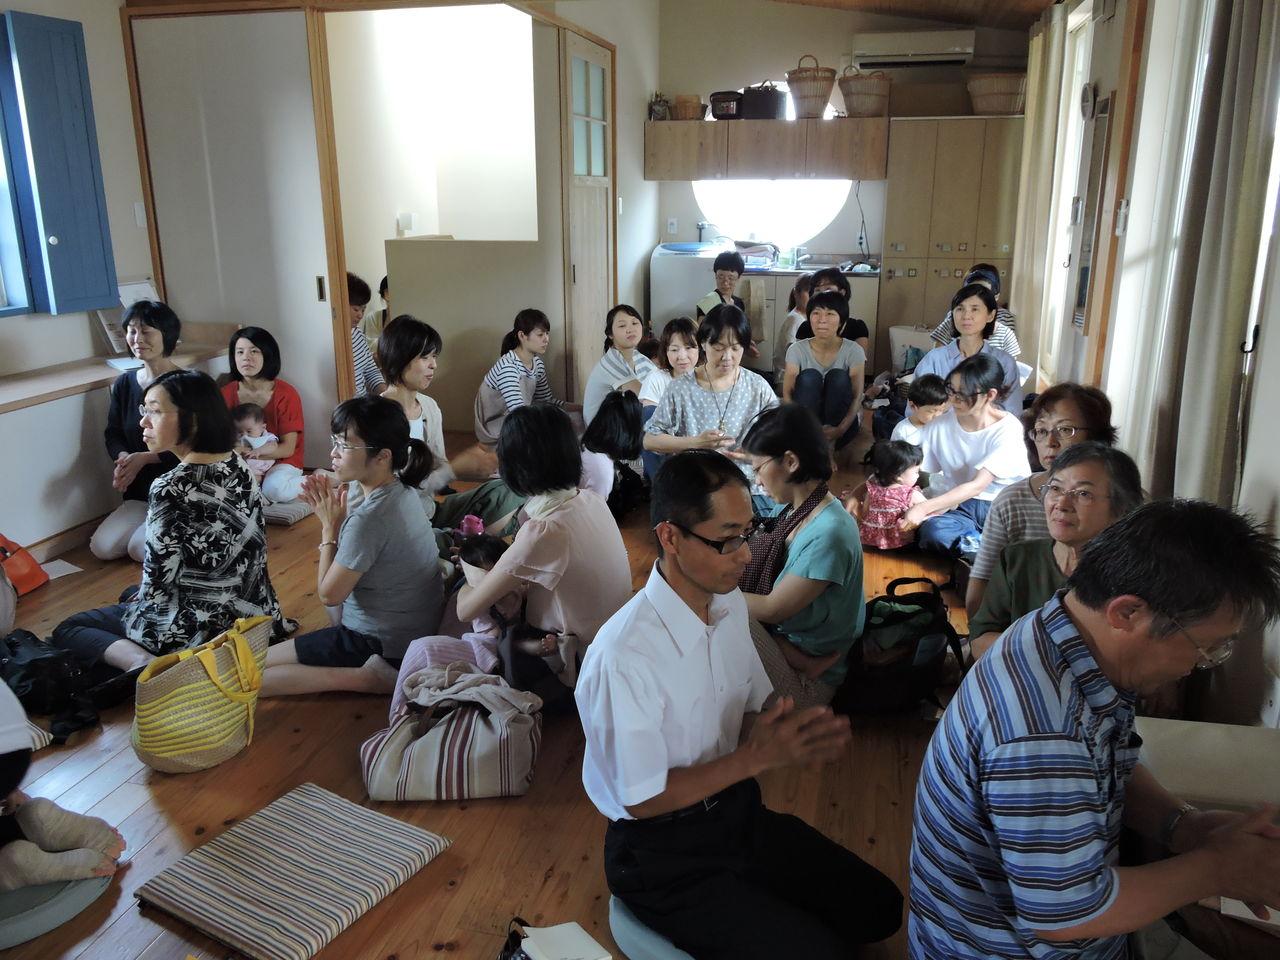 http://livedoor.blogimg.jp/yuki0122shunsei0513/imgs/a/8/a81515cf.jpg